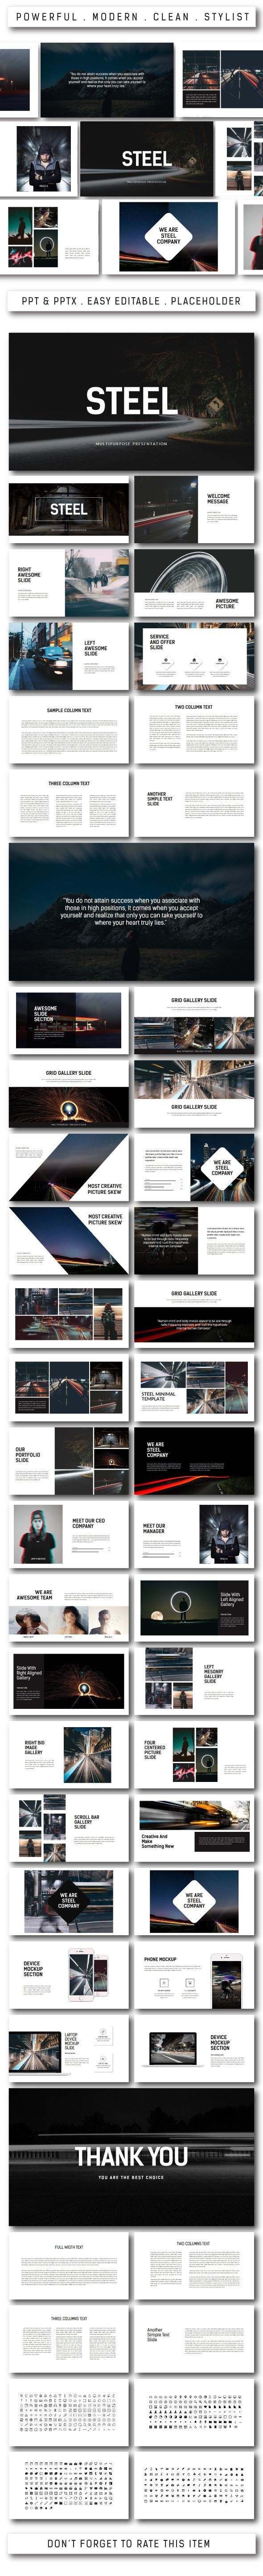 Steel Multipurpose Powerpoint - PowerPoint Templates Presentation Templates